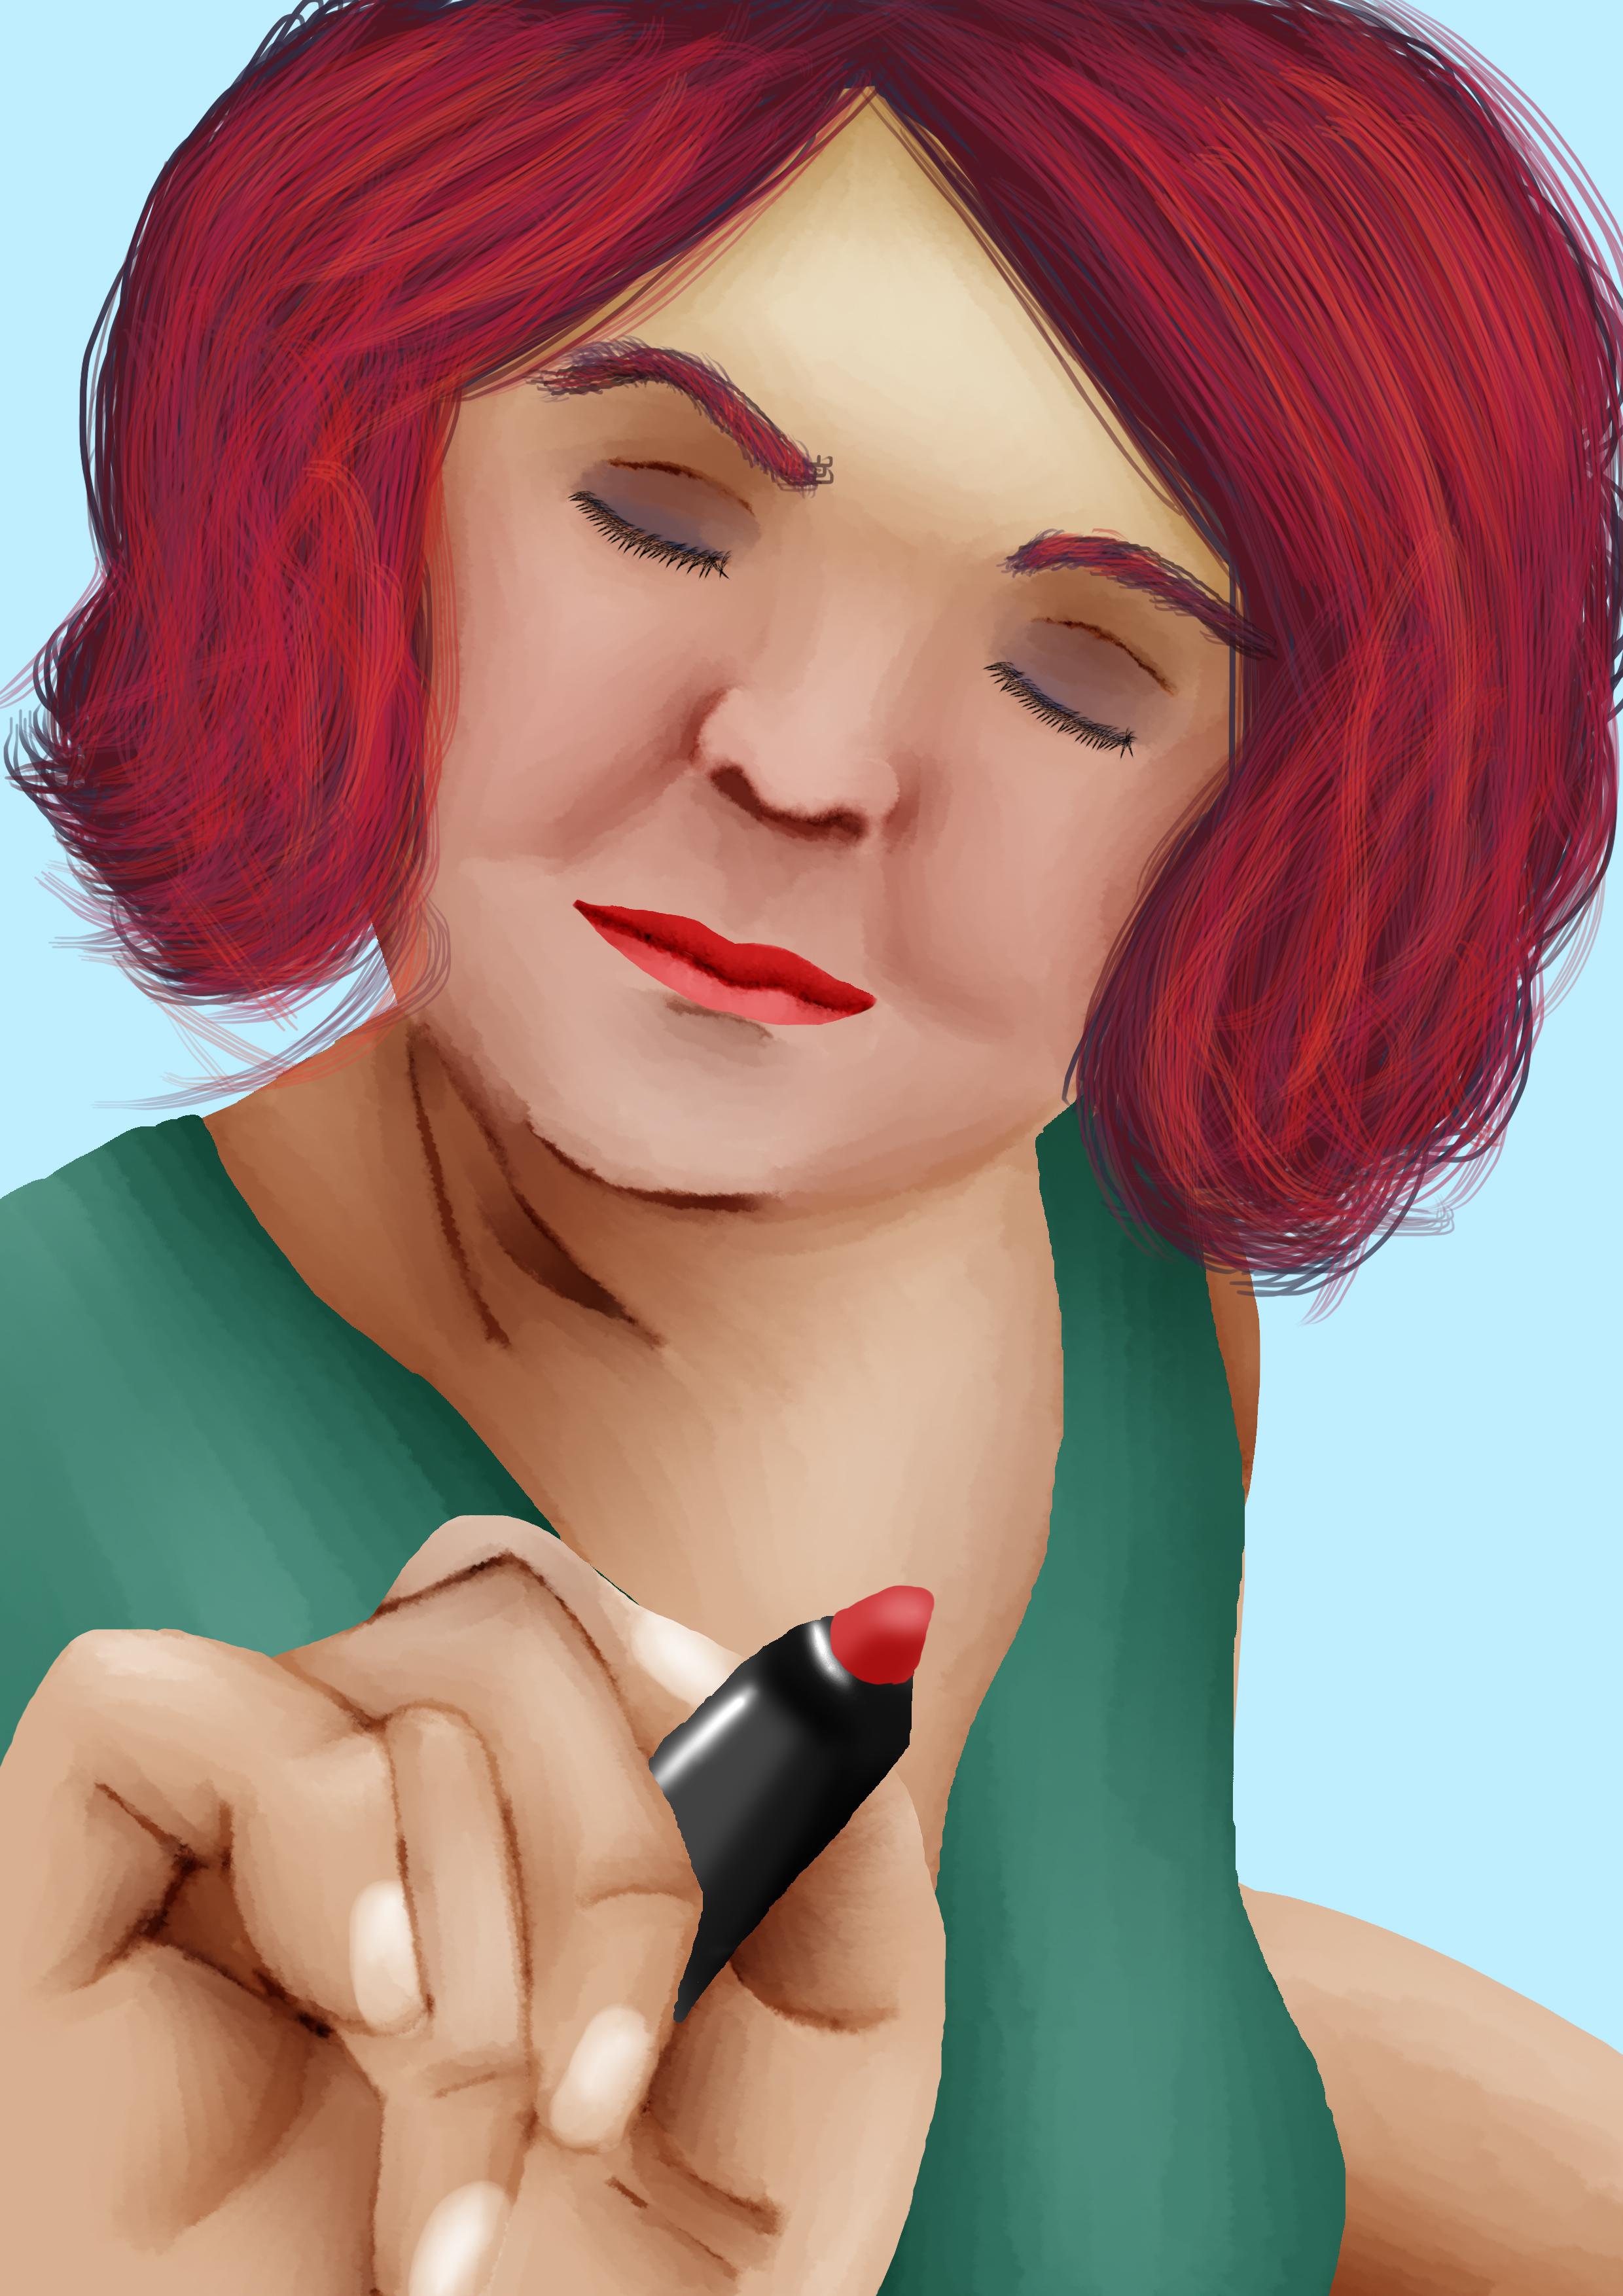 Lipstick?